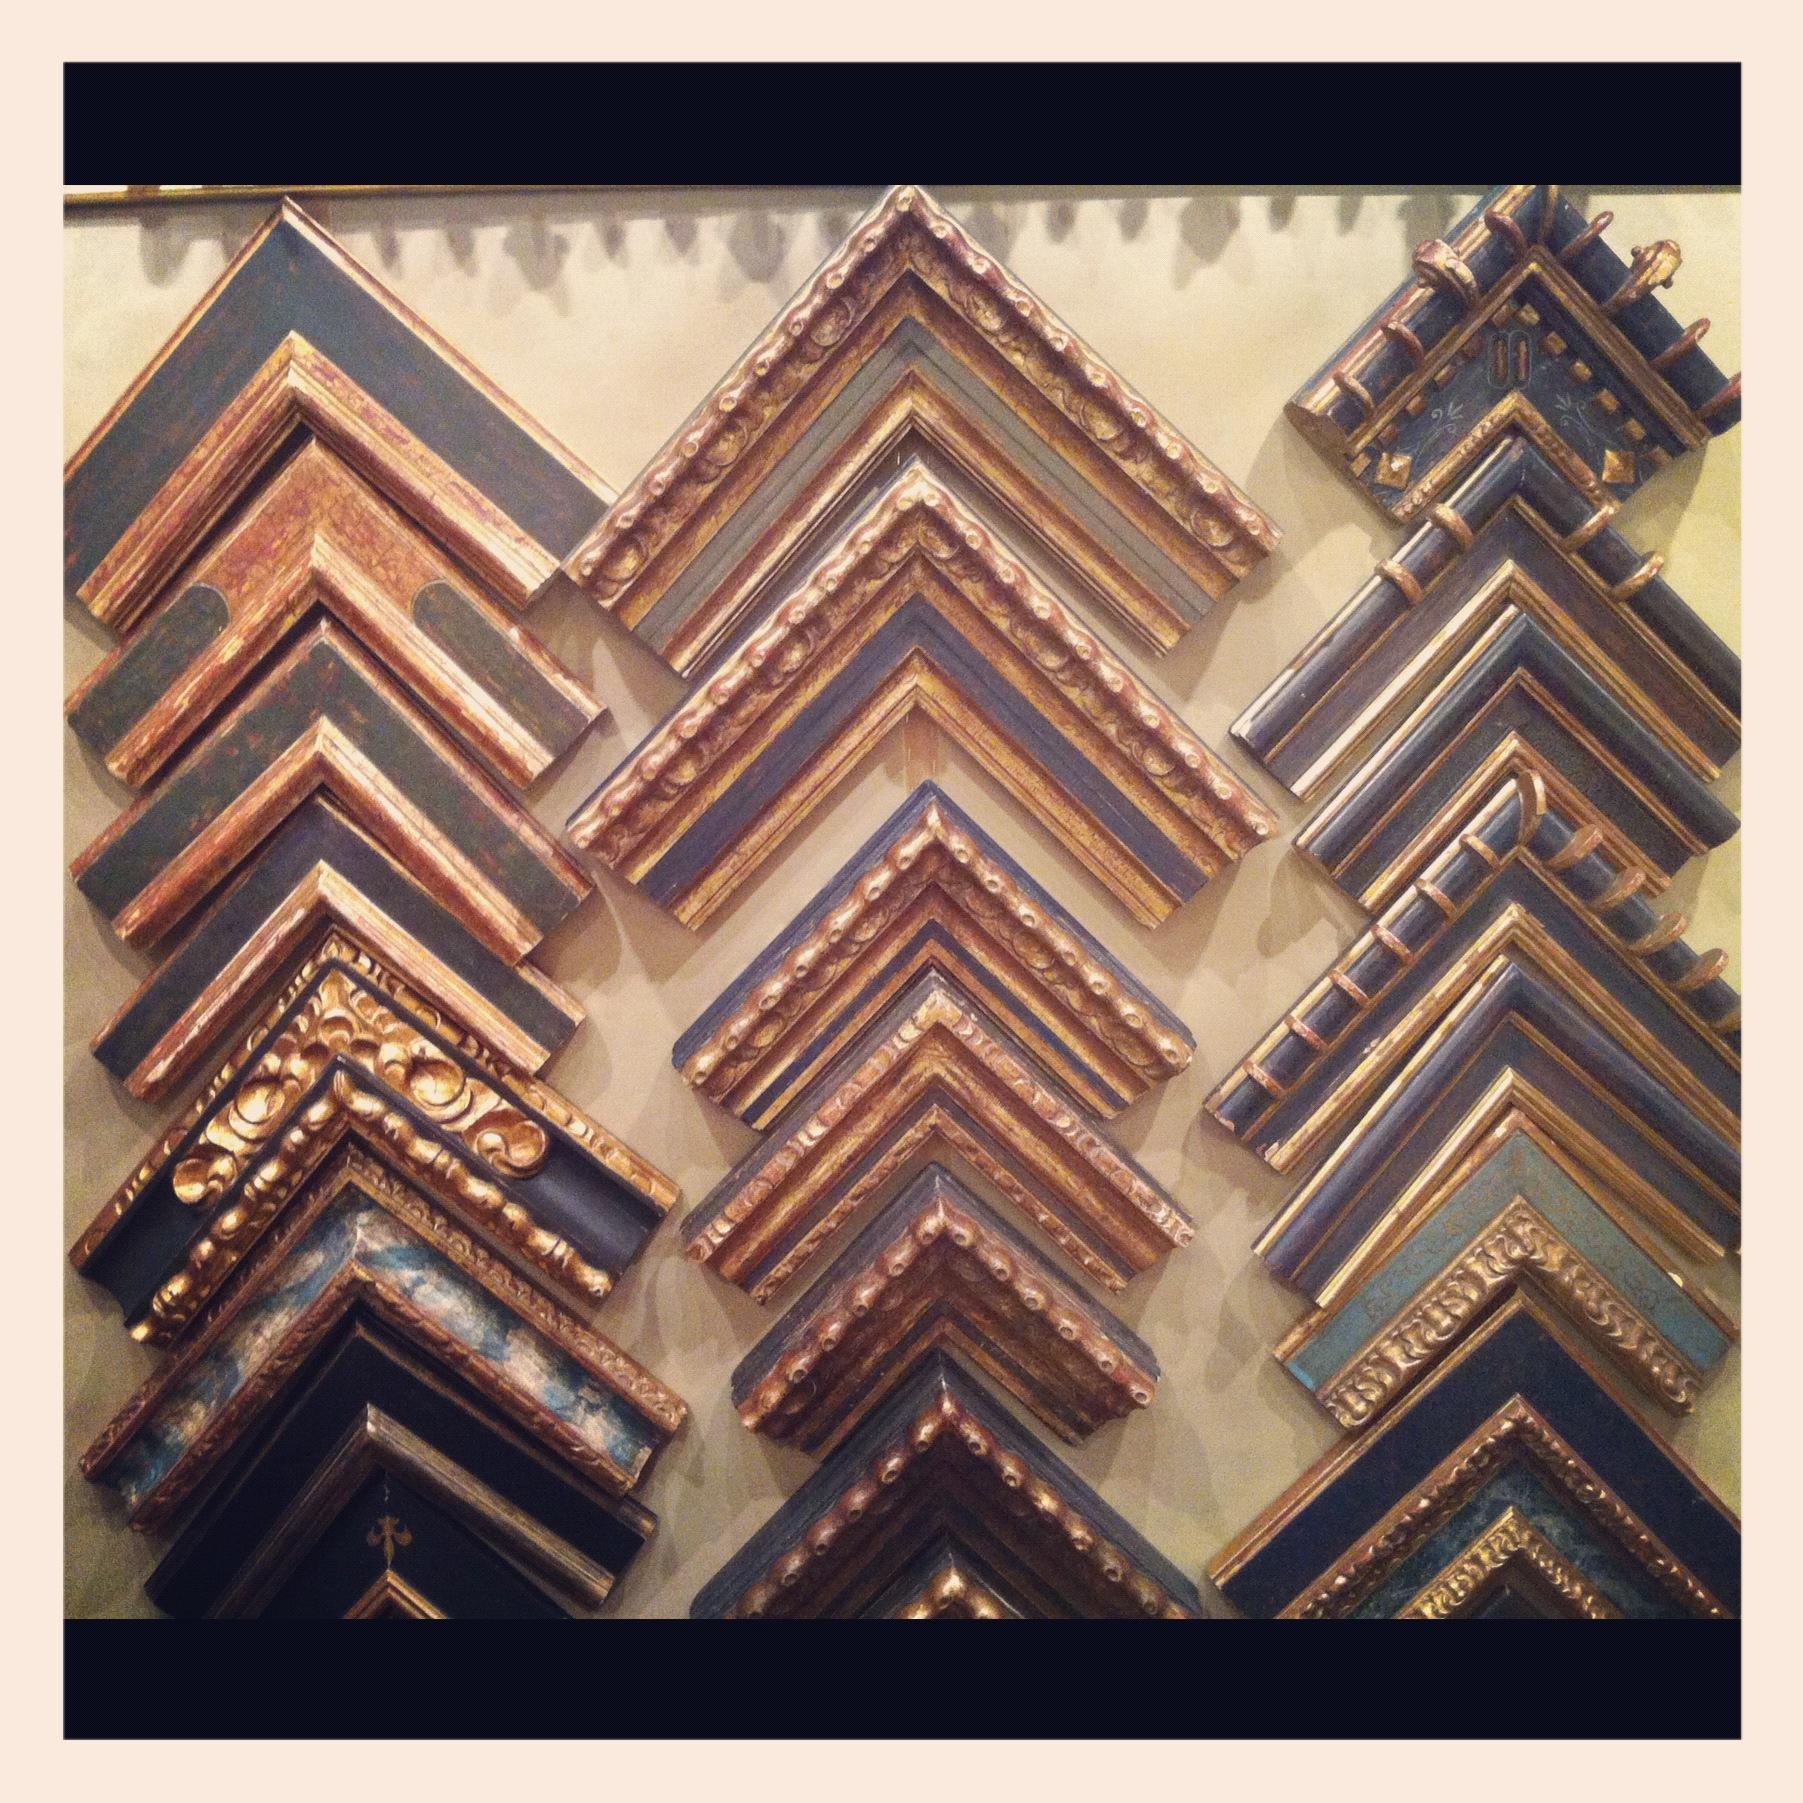 Analcai, marcos artesanales desde 1962 | Beautiful Life Magazine